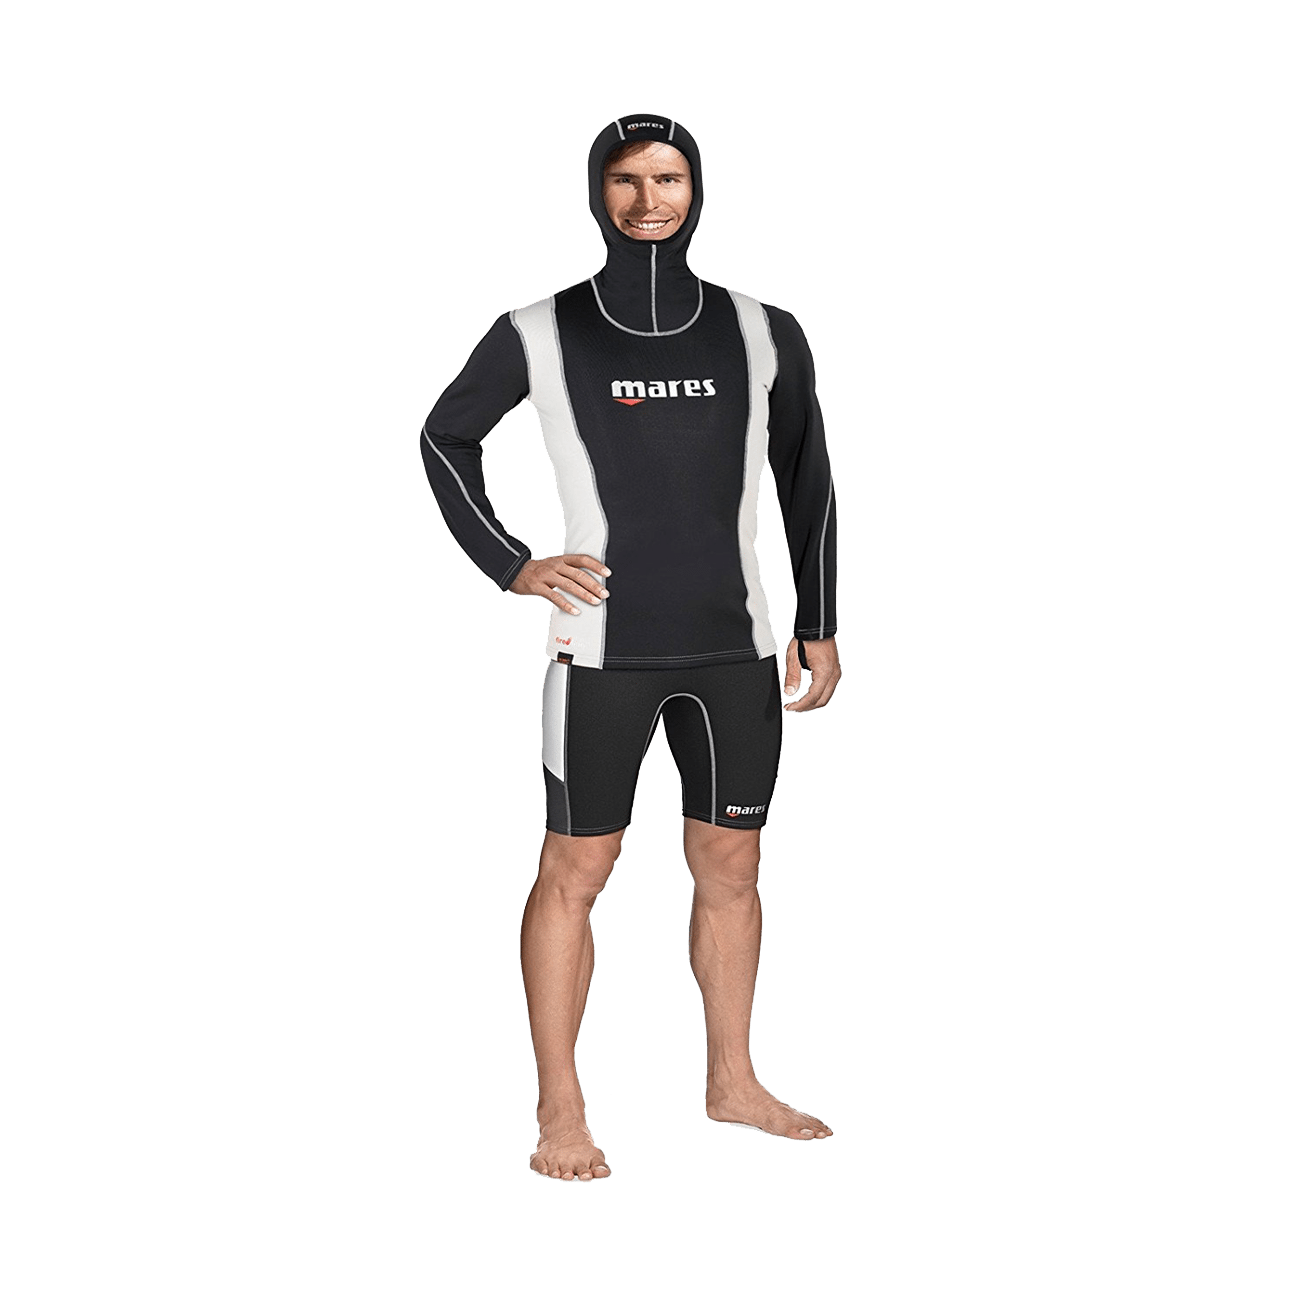 Mares Fire Skin Long Sleeve With Hood | Mares Rashguards | Mares Singapore